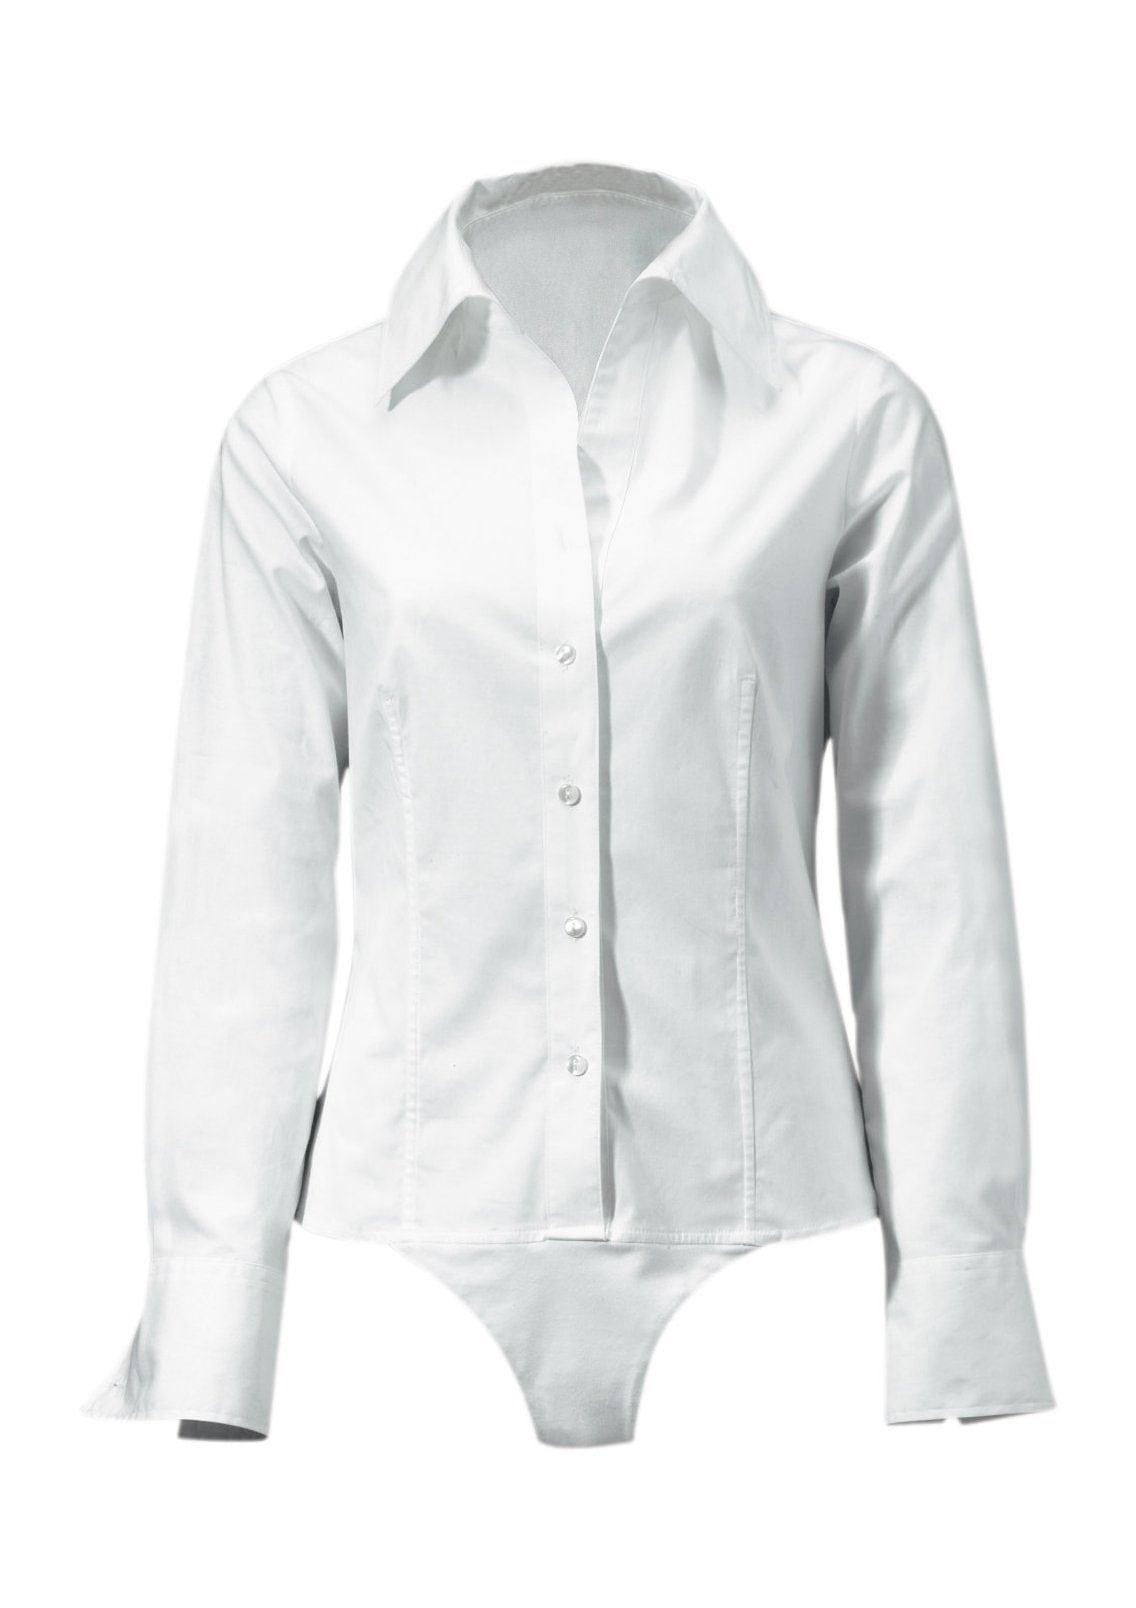 Image of Aniston SELECTED Blusenbody, mit tiefem Ausschnitt